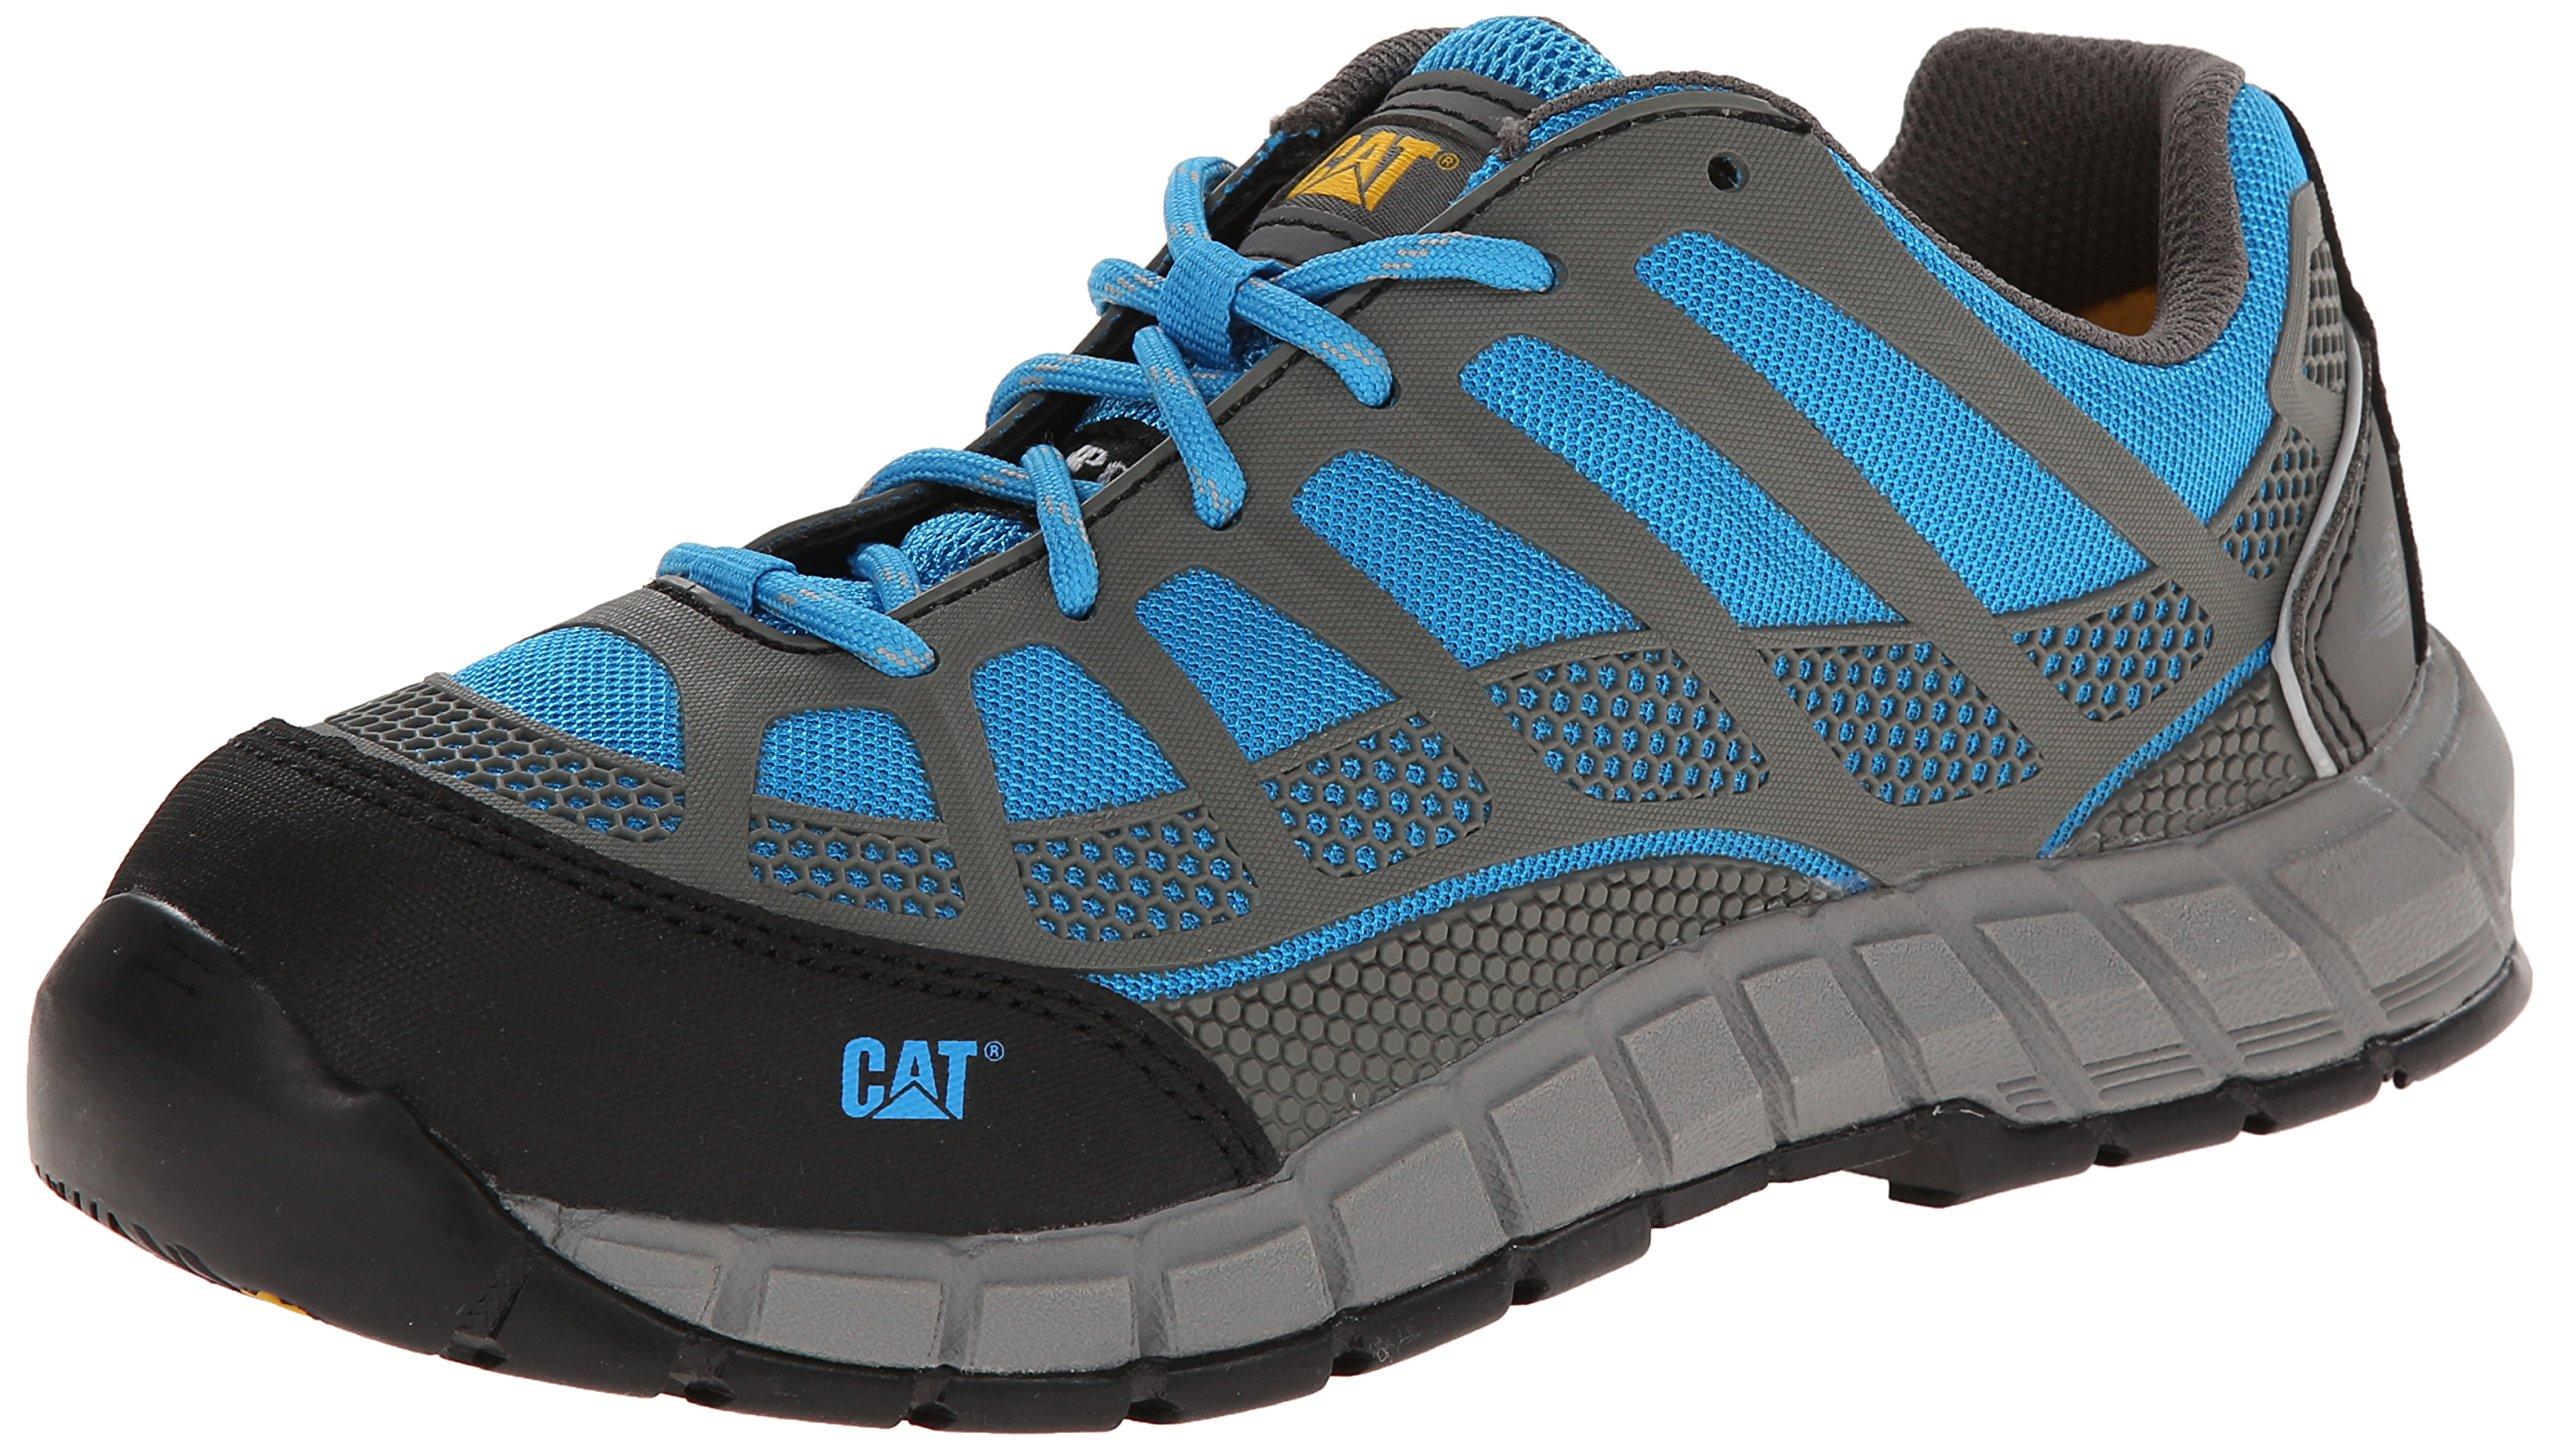 Caterpillar Women's Streamline Comp Toe Work Shoe, Blue, 8.5 M US